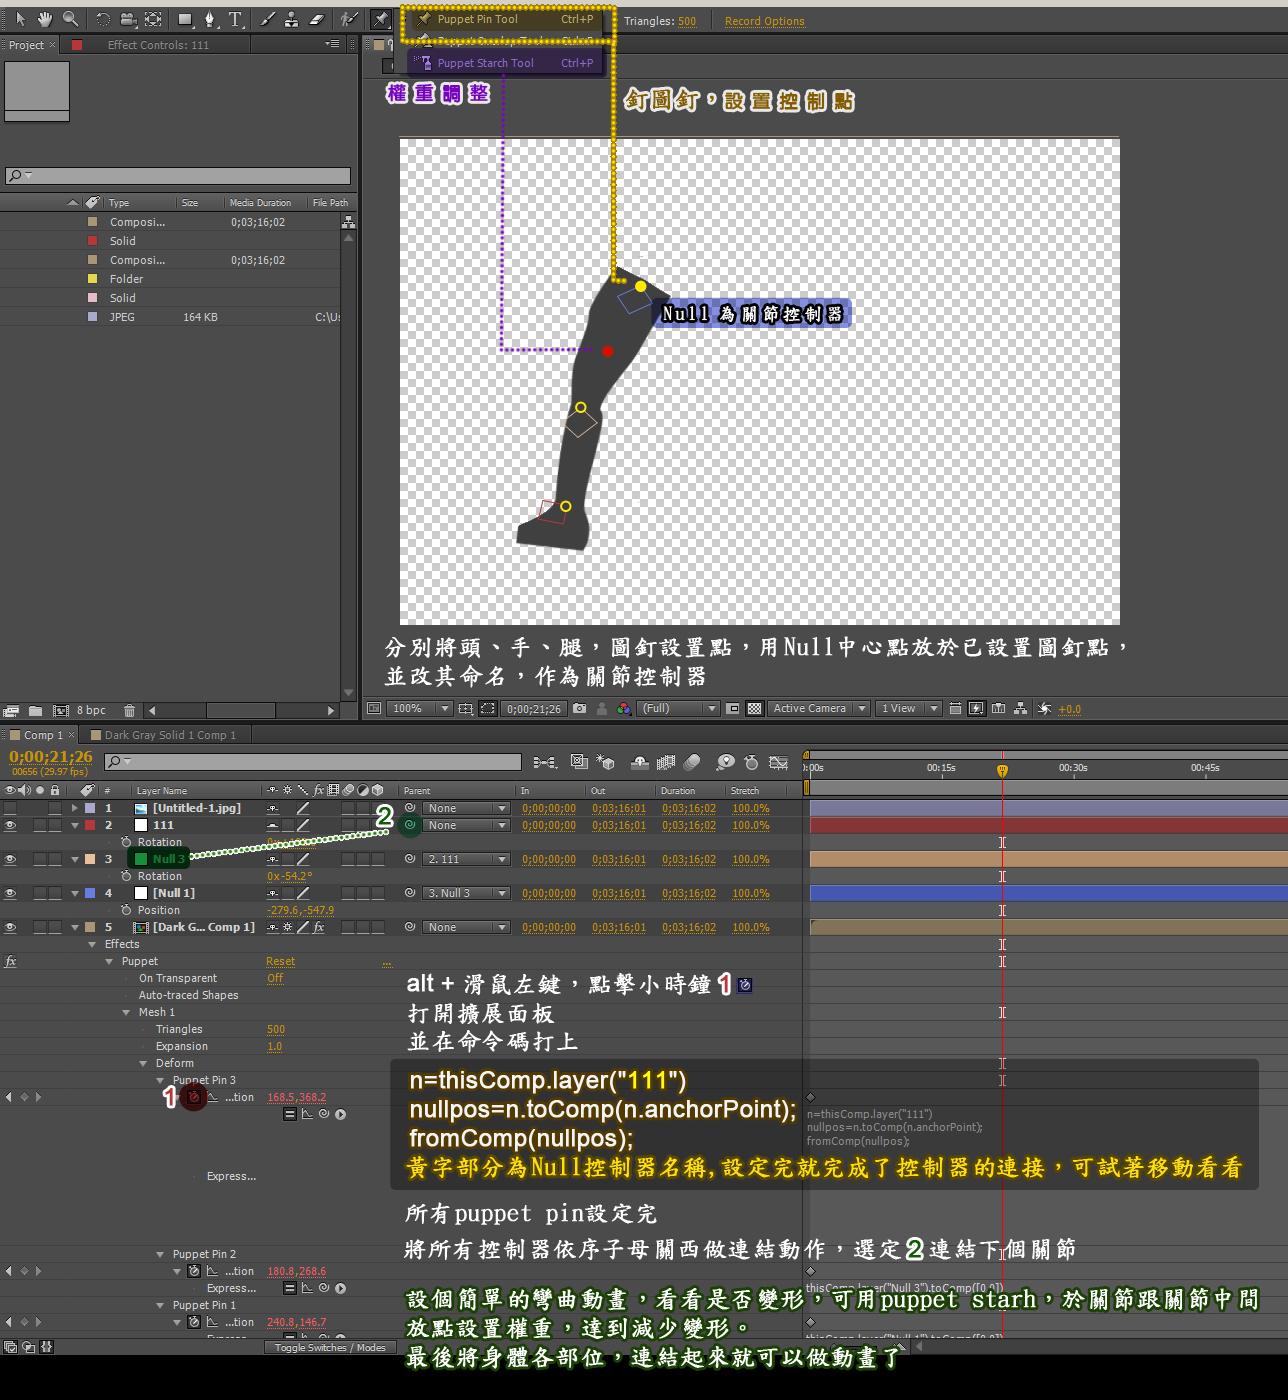 MO Artist Design 小毛 影像創意: AE puppet pin tool 骨架綁定控制器 筆記